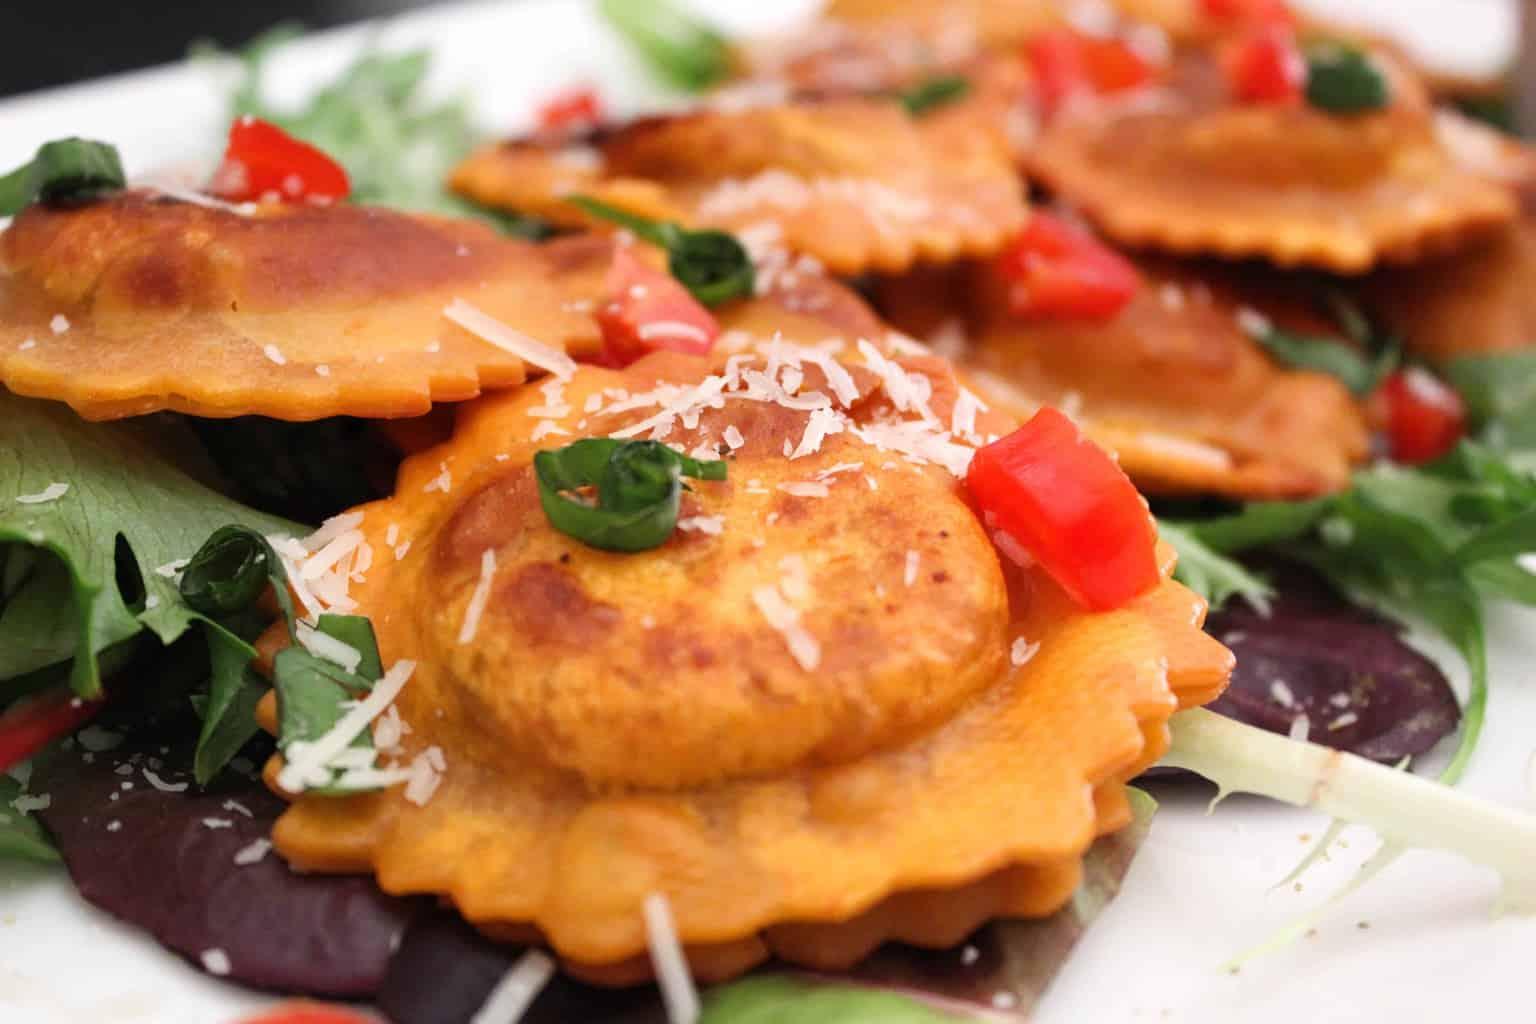 Easy Pan Fried Ravioli Appetizer